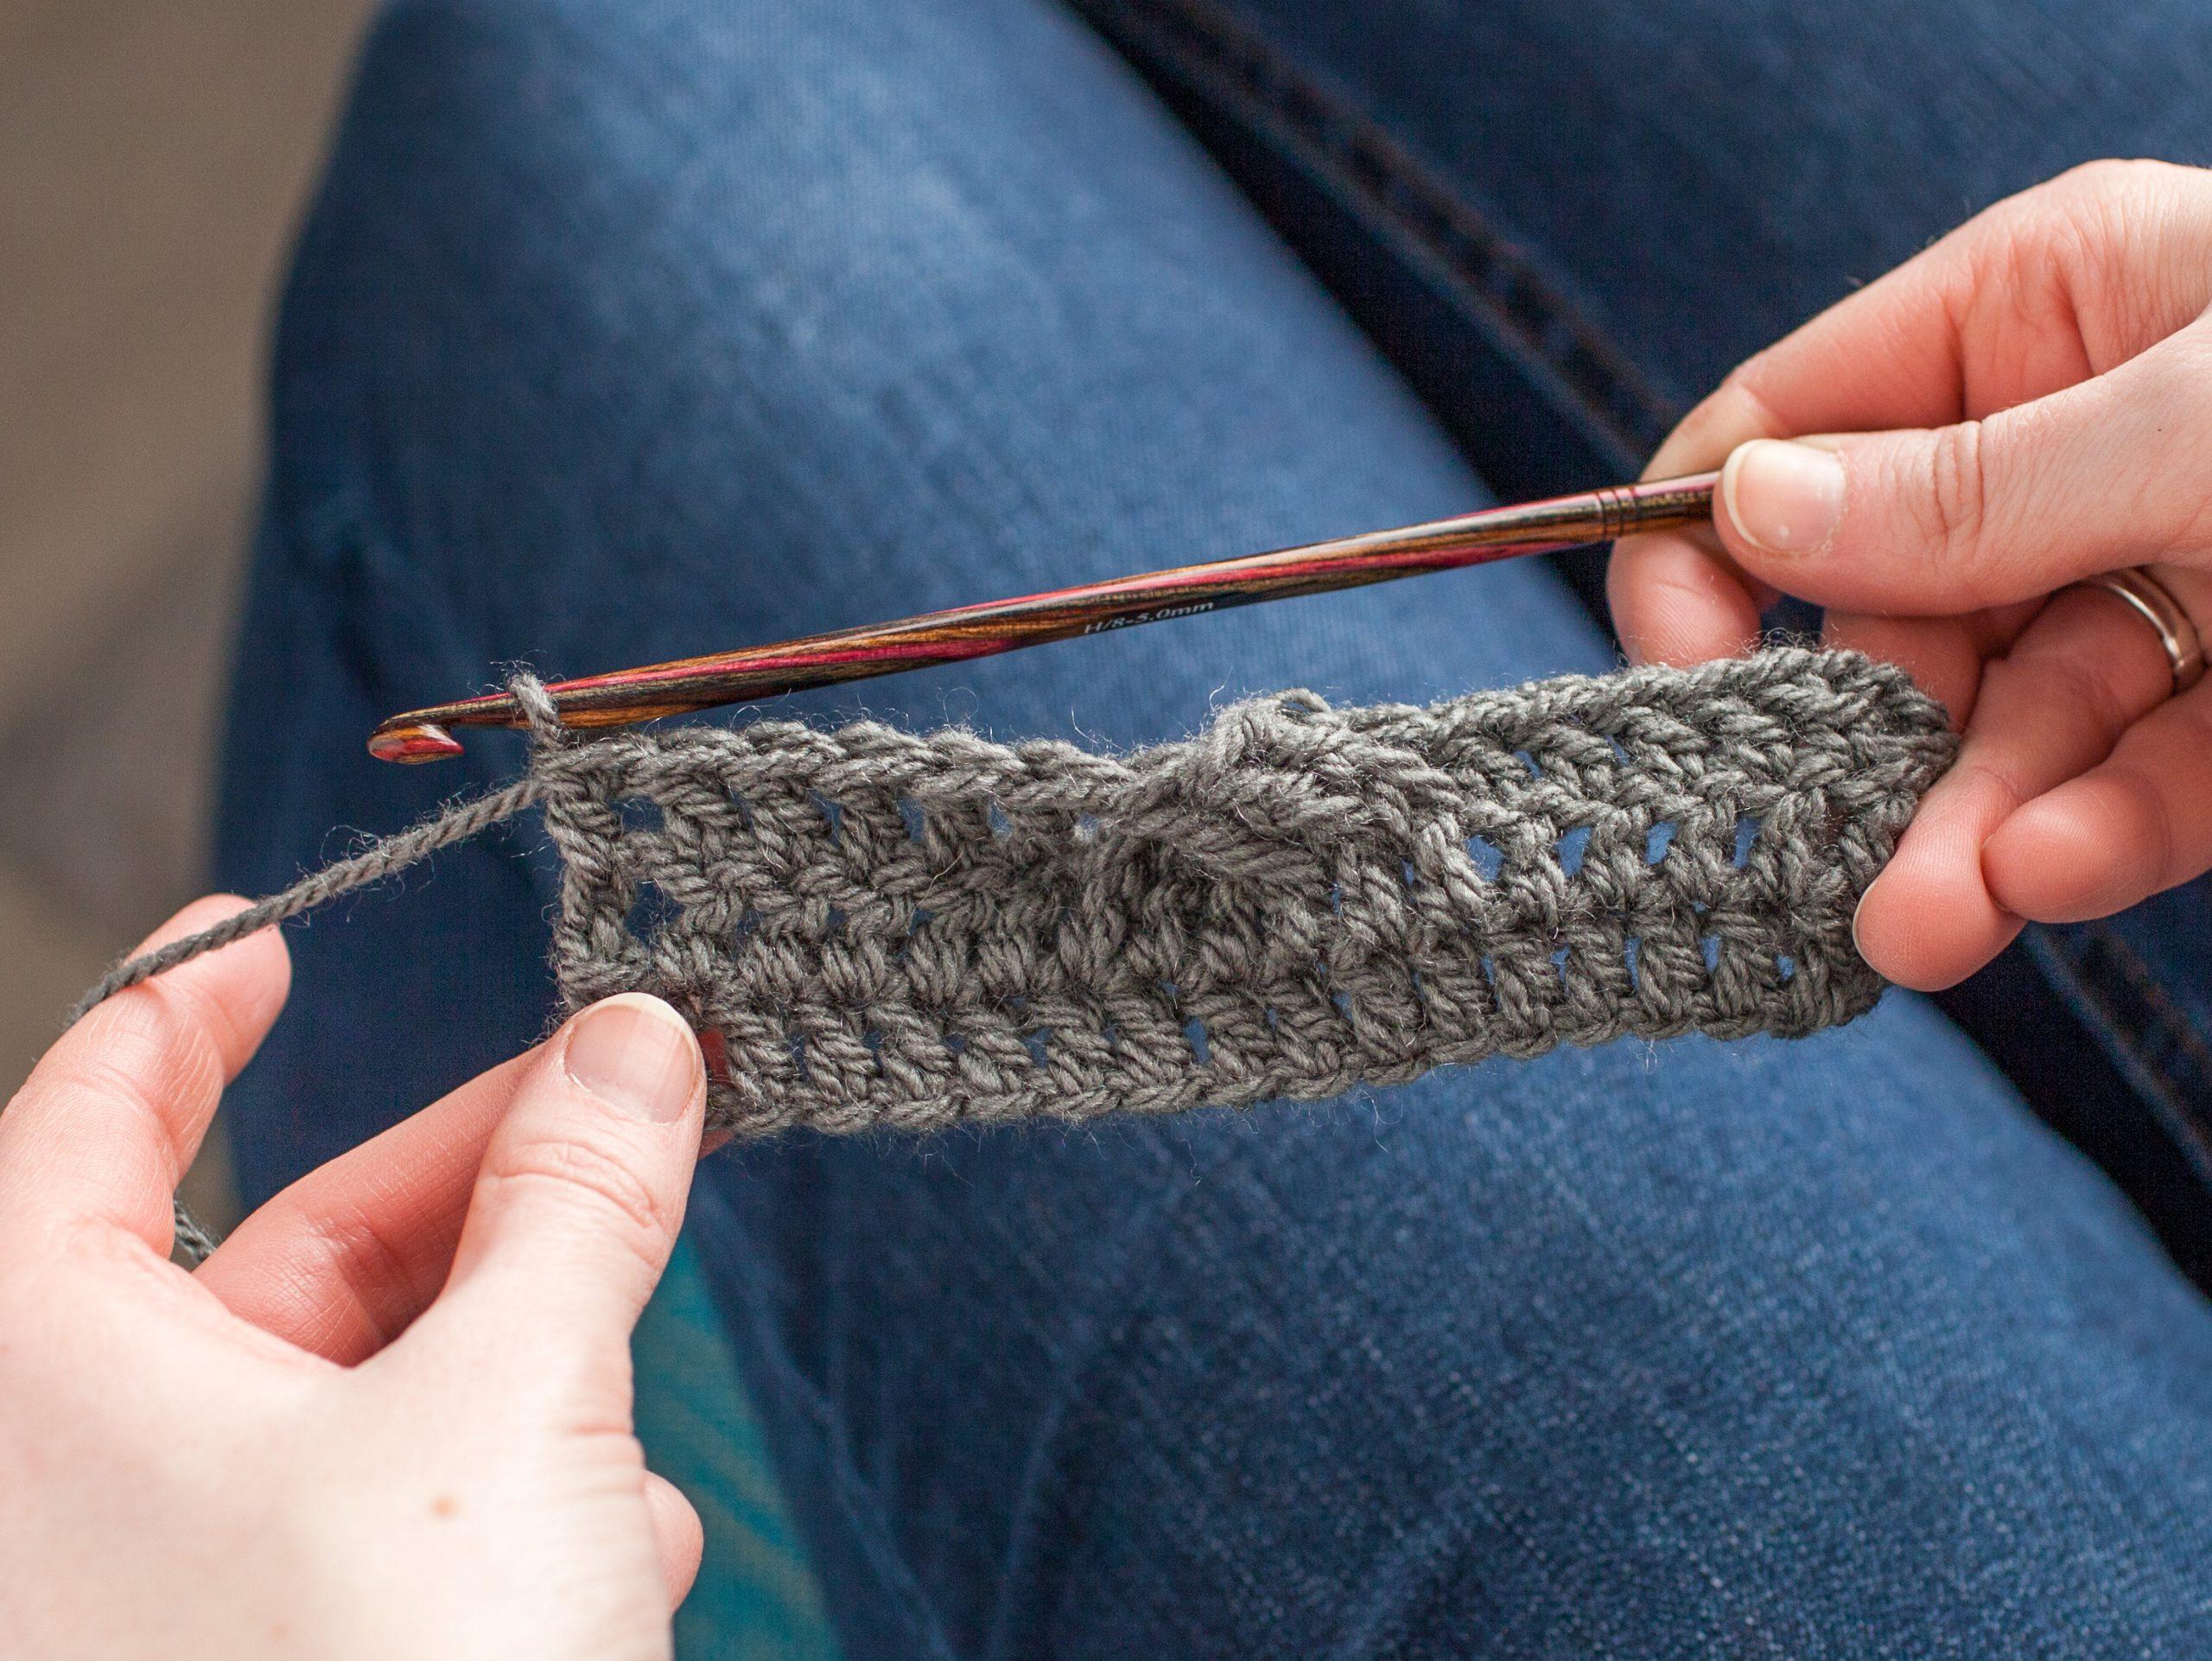 Person crocheting